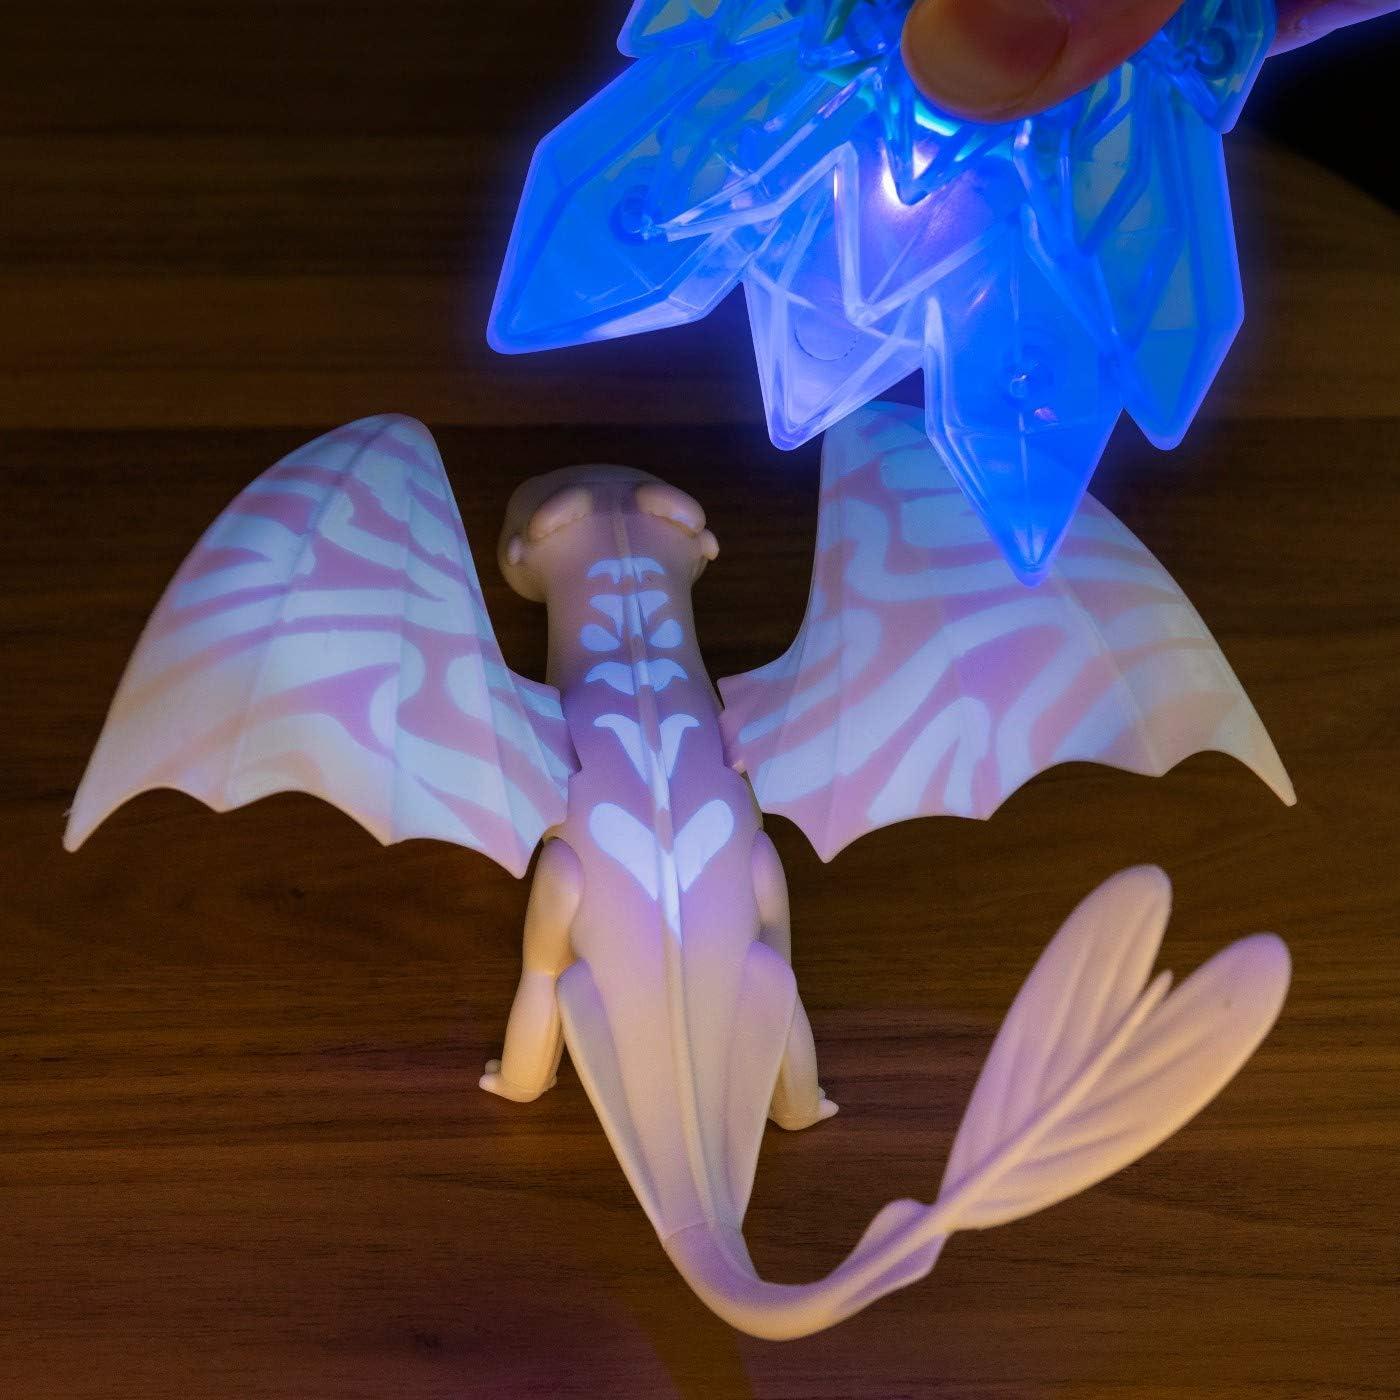 DREAMWORKS HOW TO TRAIN YOUR  DRAGON HIDDEN WORLD BIOLUMINESCENT LIGHTFURY